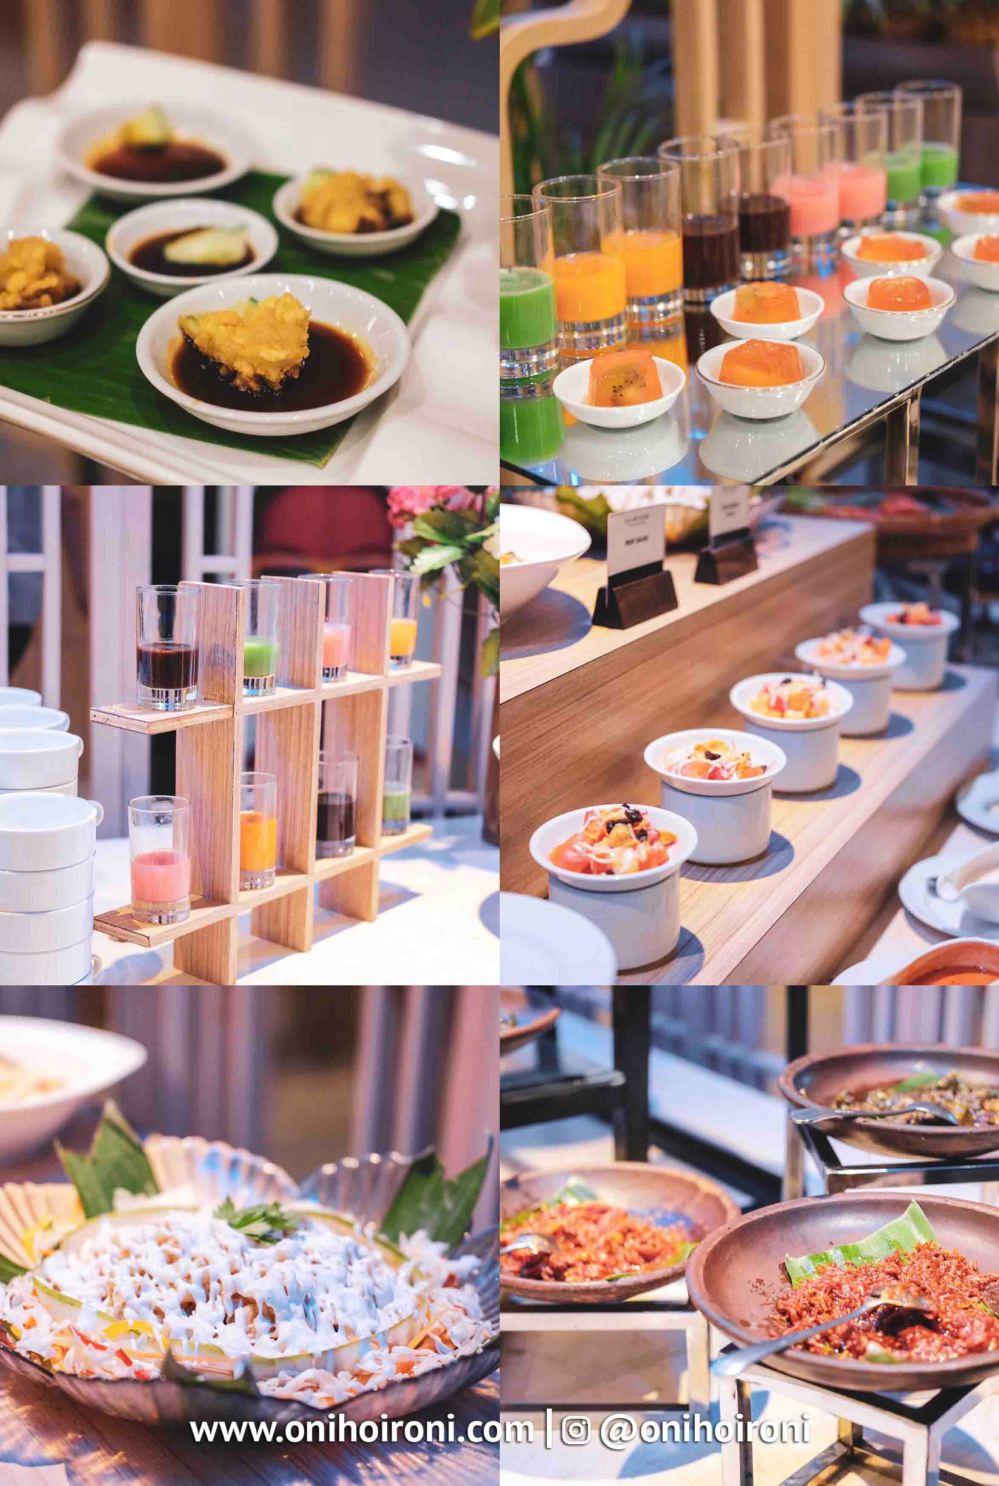 1 Buffet Lime Restaurant Fave Hotel palembang Oni Hoironi